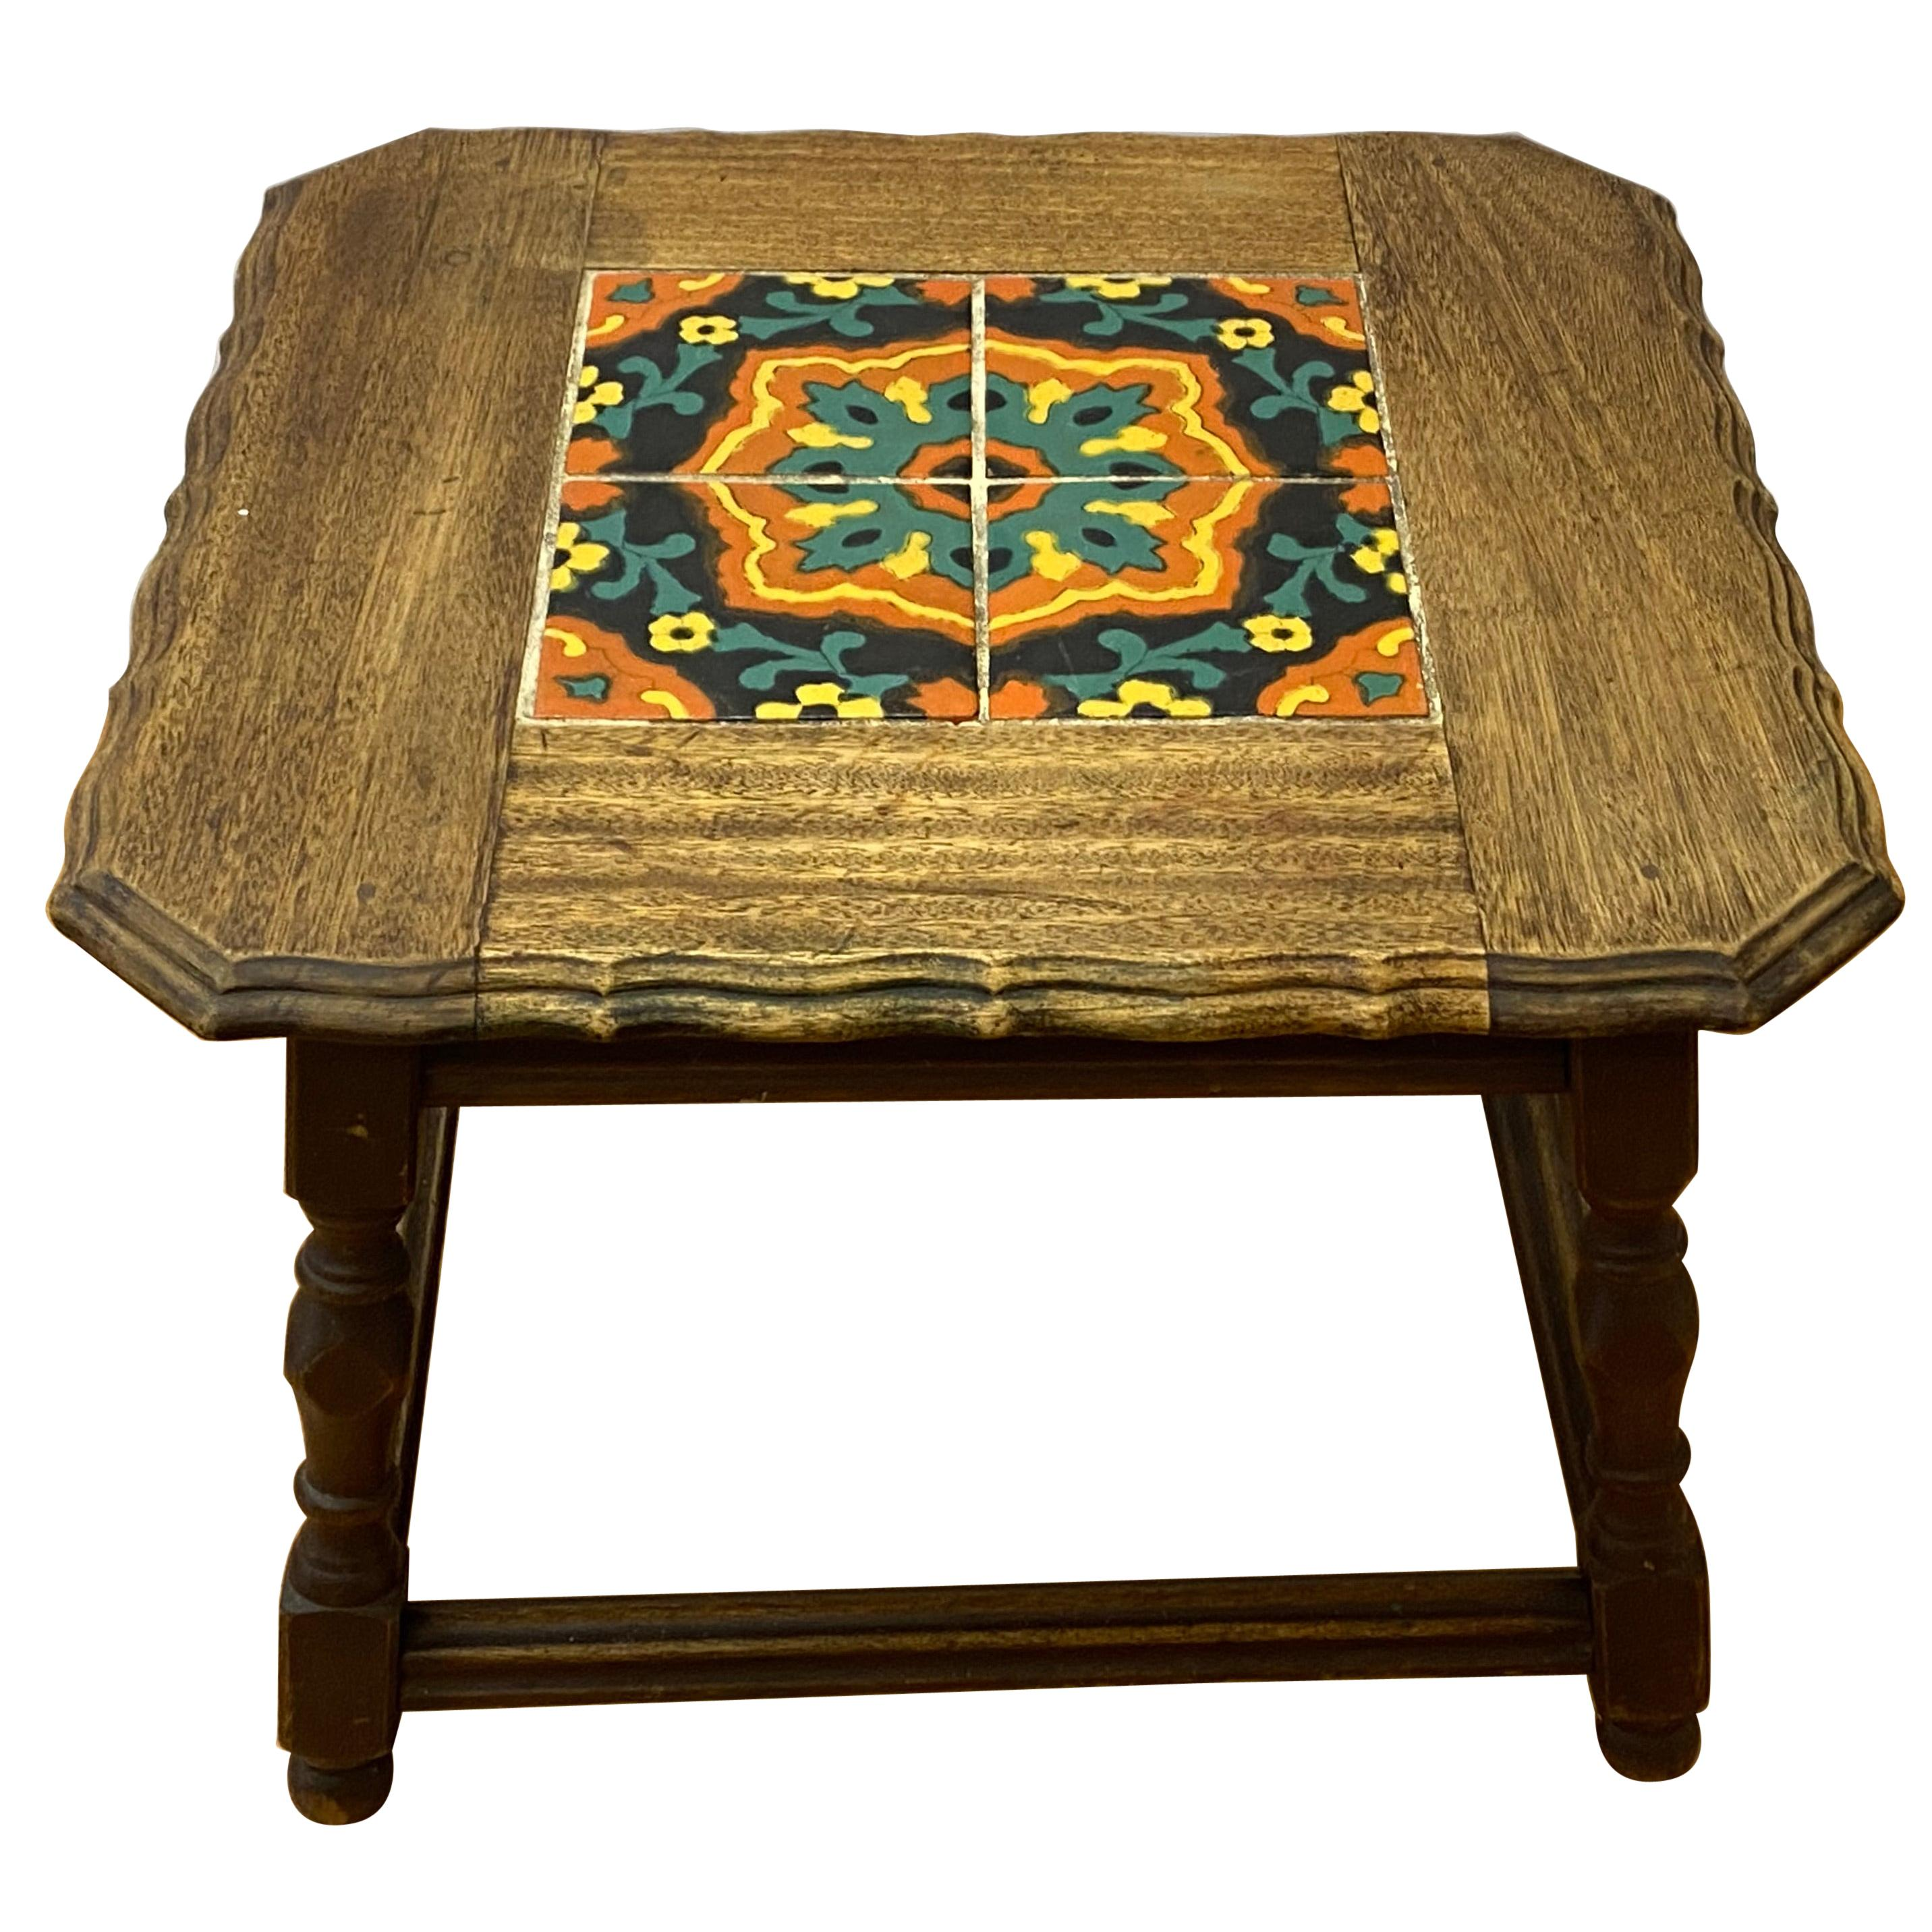 Mission Oak Arts & Crafts Tile-Top Side Table, circa 1920